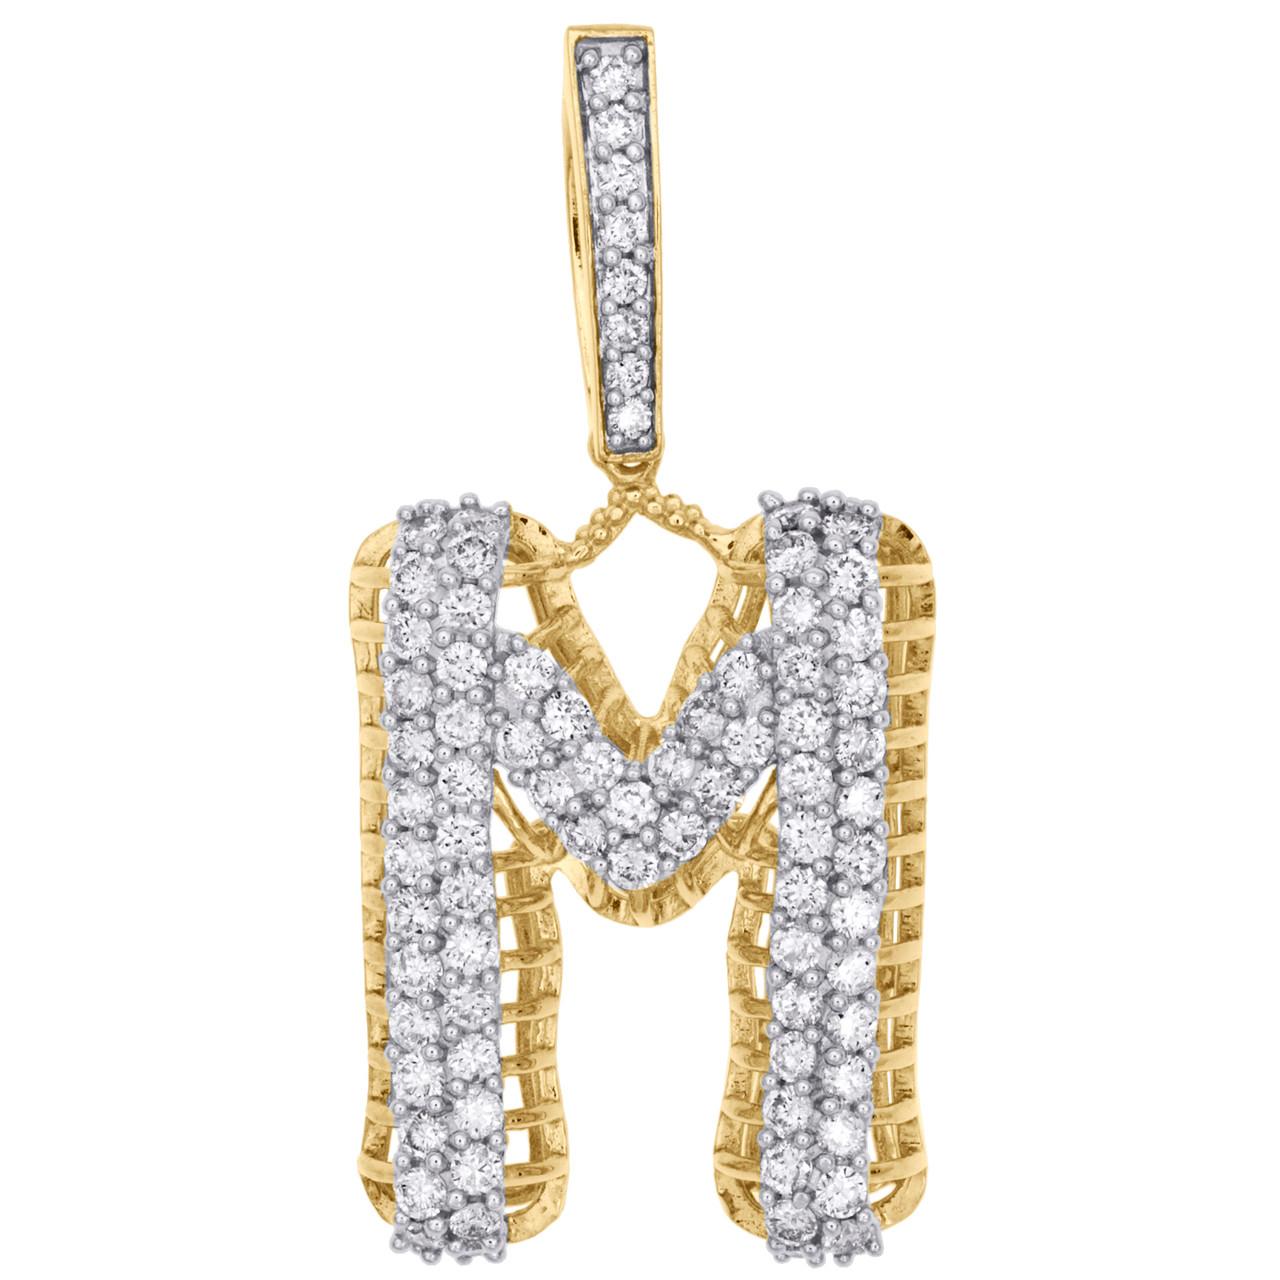 10k Yellow Gold Initial M Charm Pendant